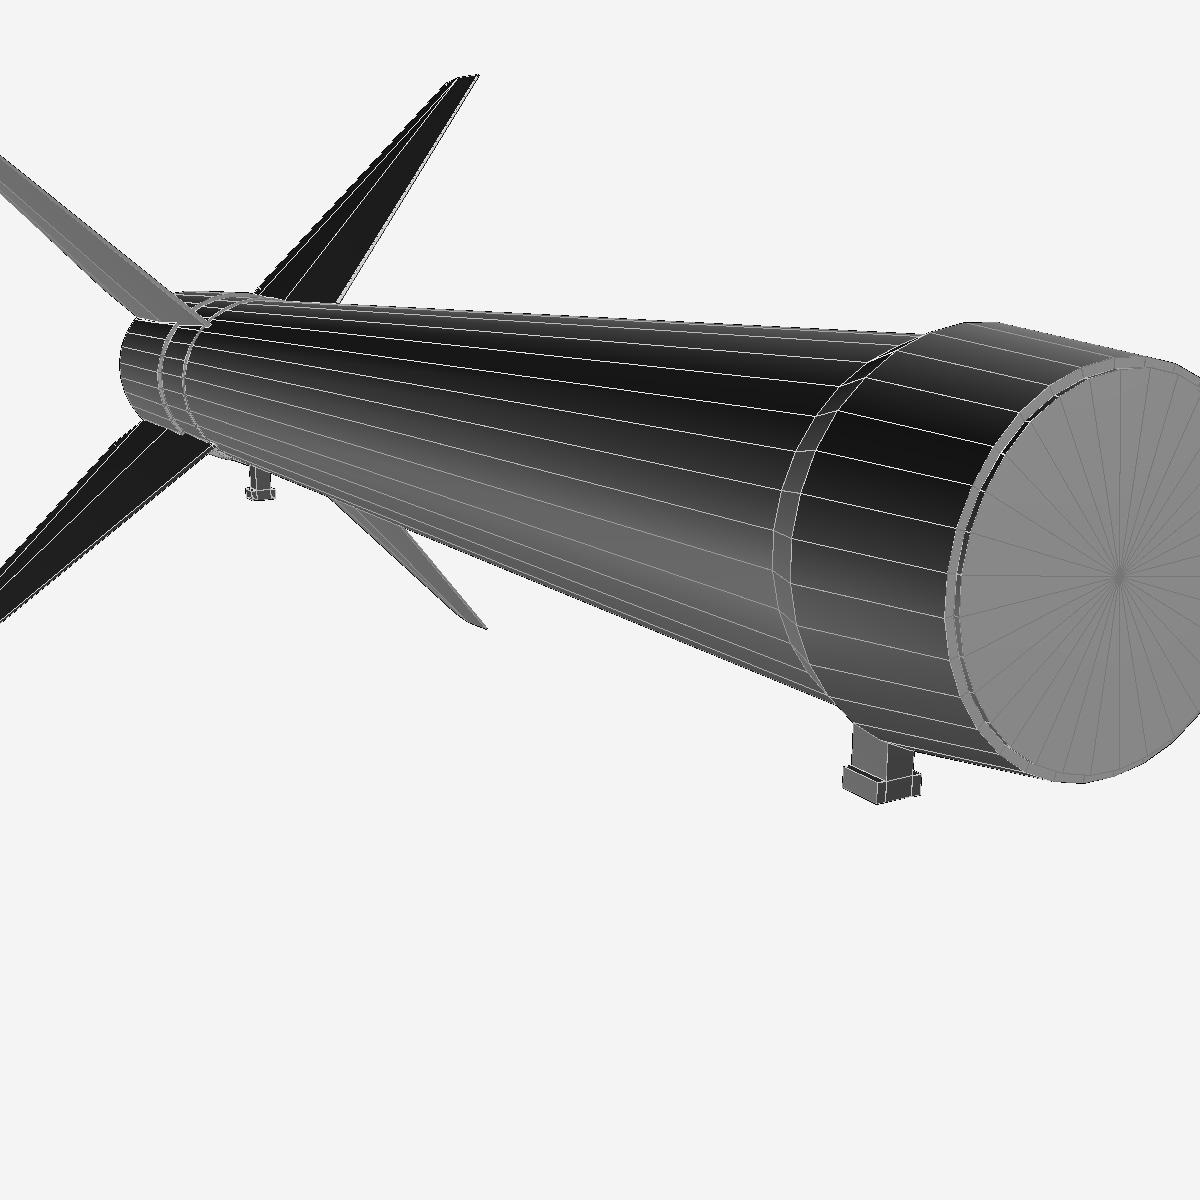 Astrobee 200 Rocket 3d model 3ds dxf fbx blend cob dae X   obj 165959